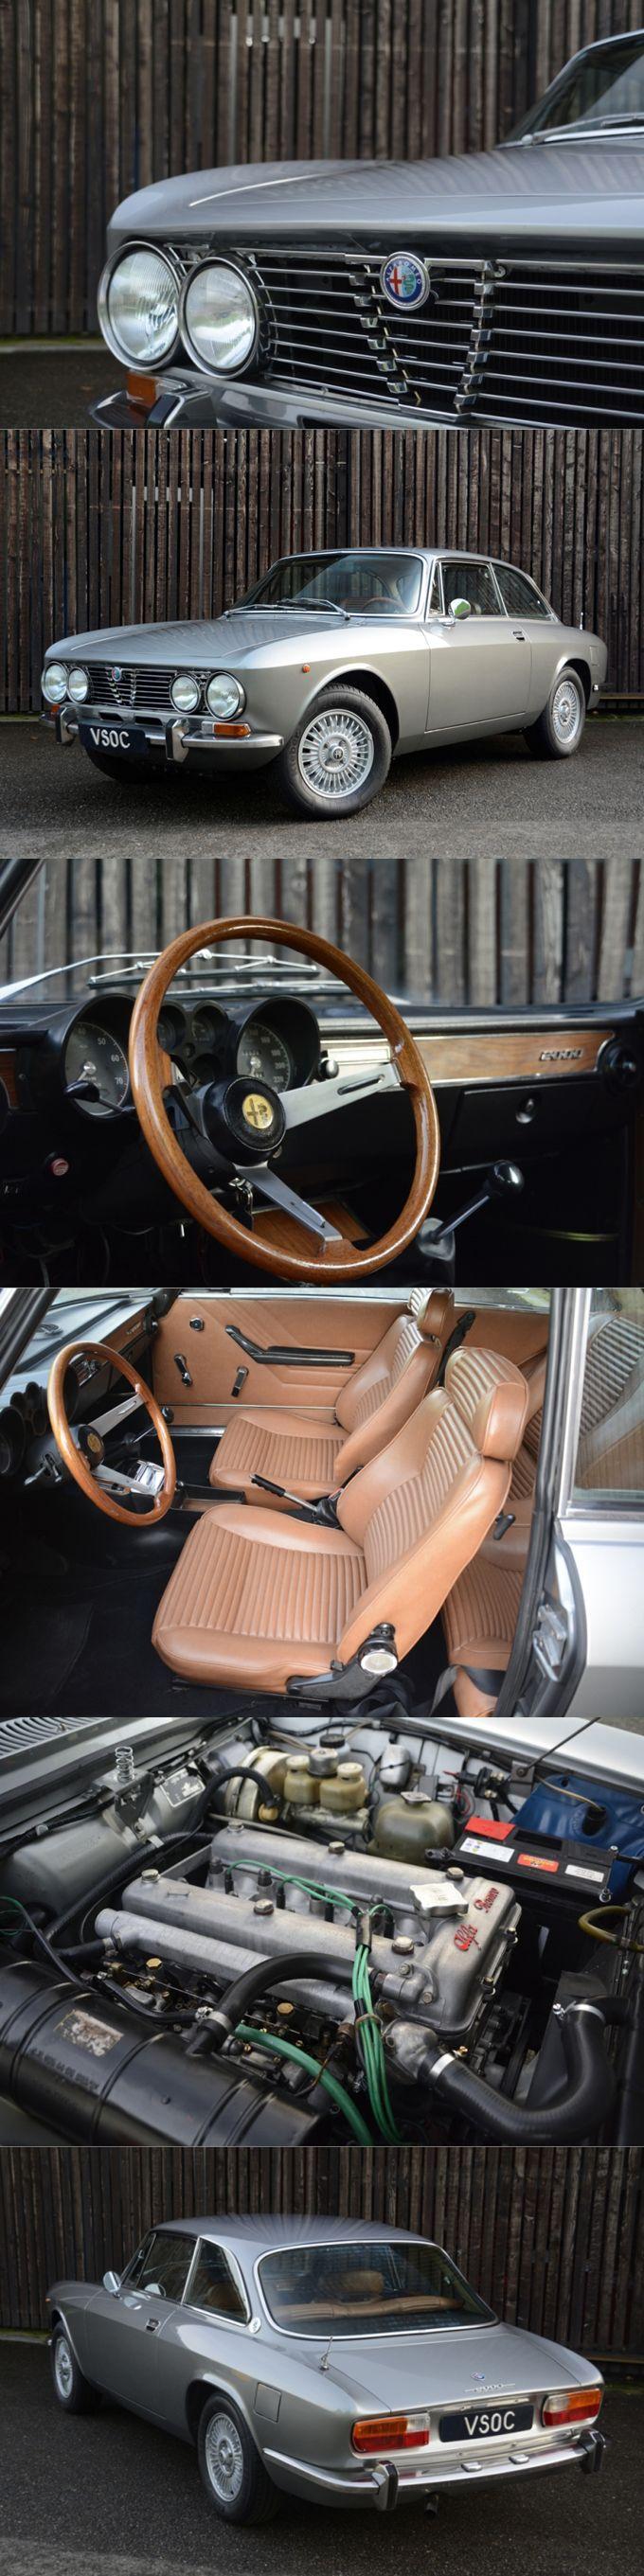 1973 Alfa Romeo 2000 GTV / VSOC.nl / Italy / silver / 17-365